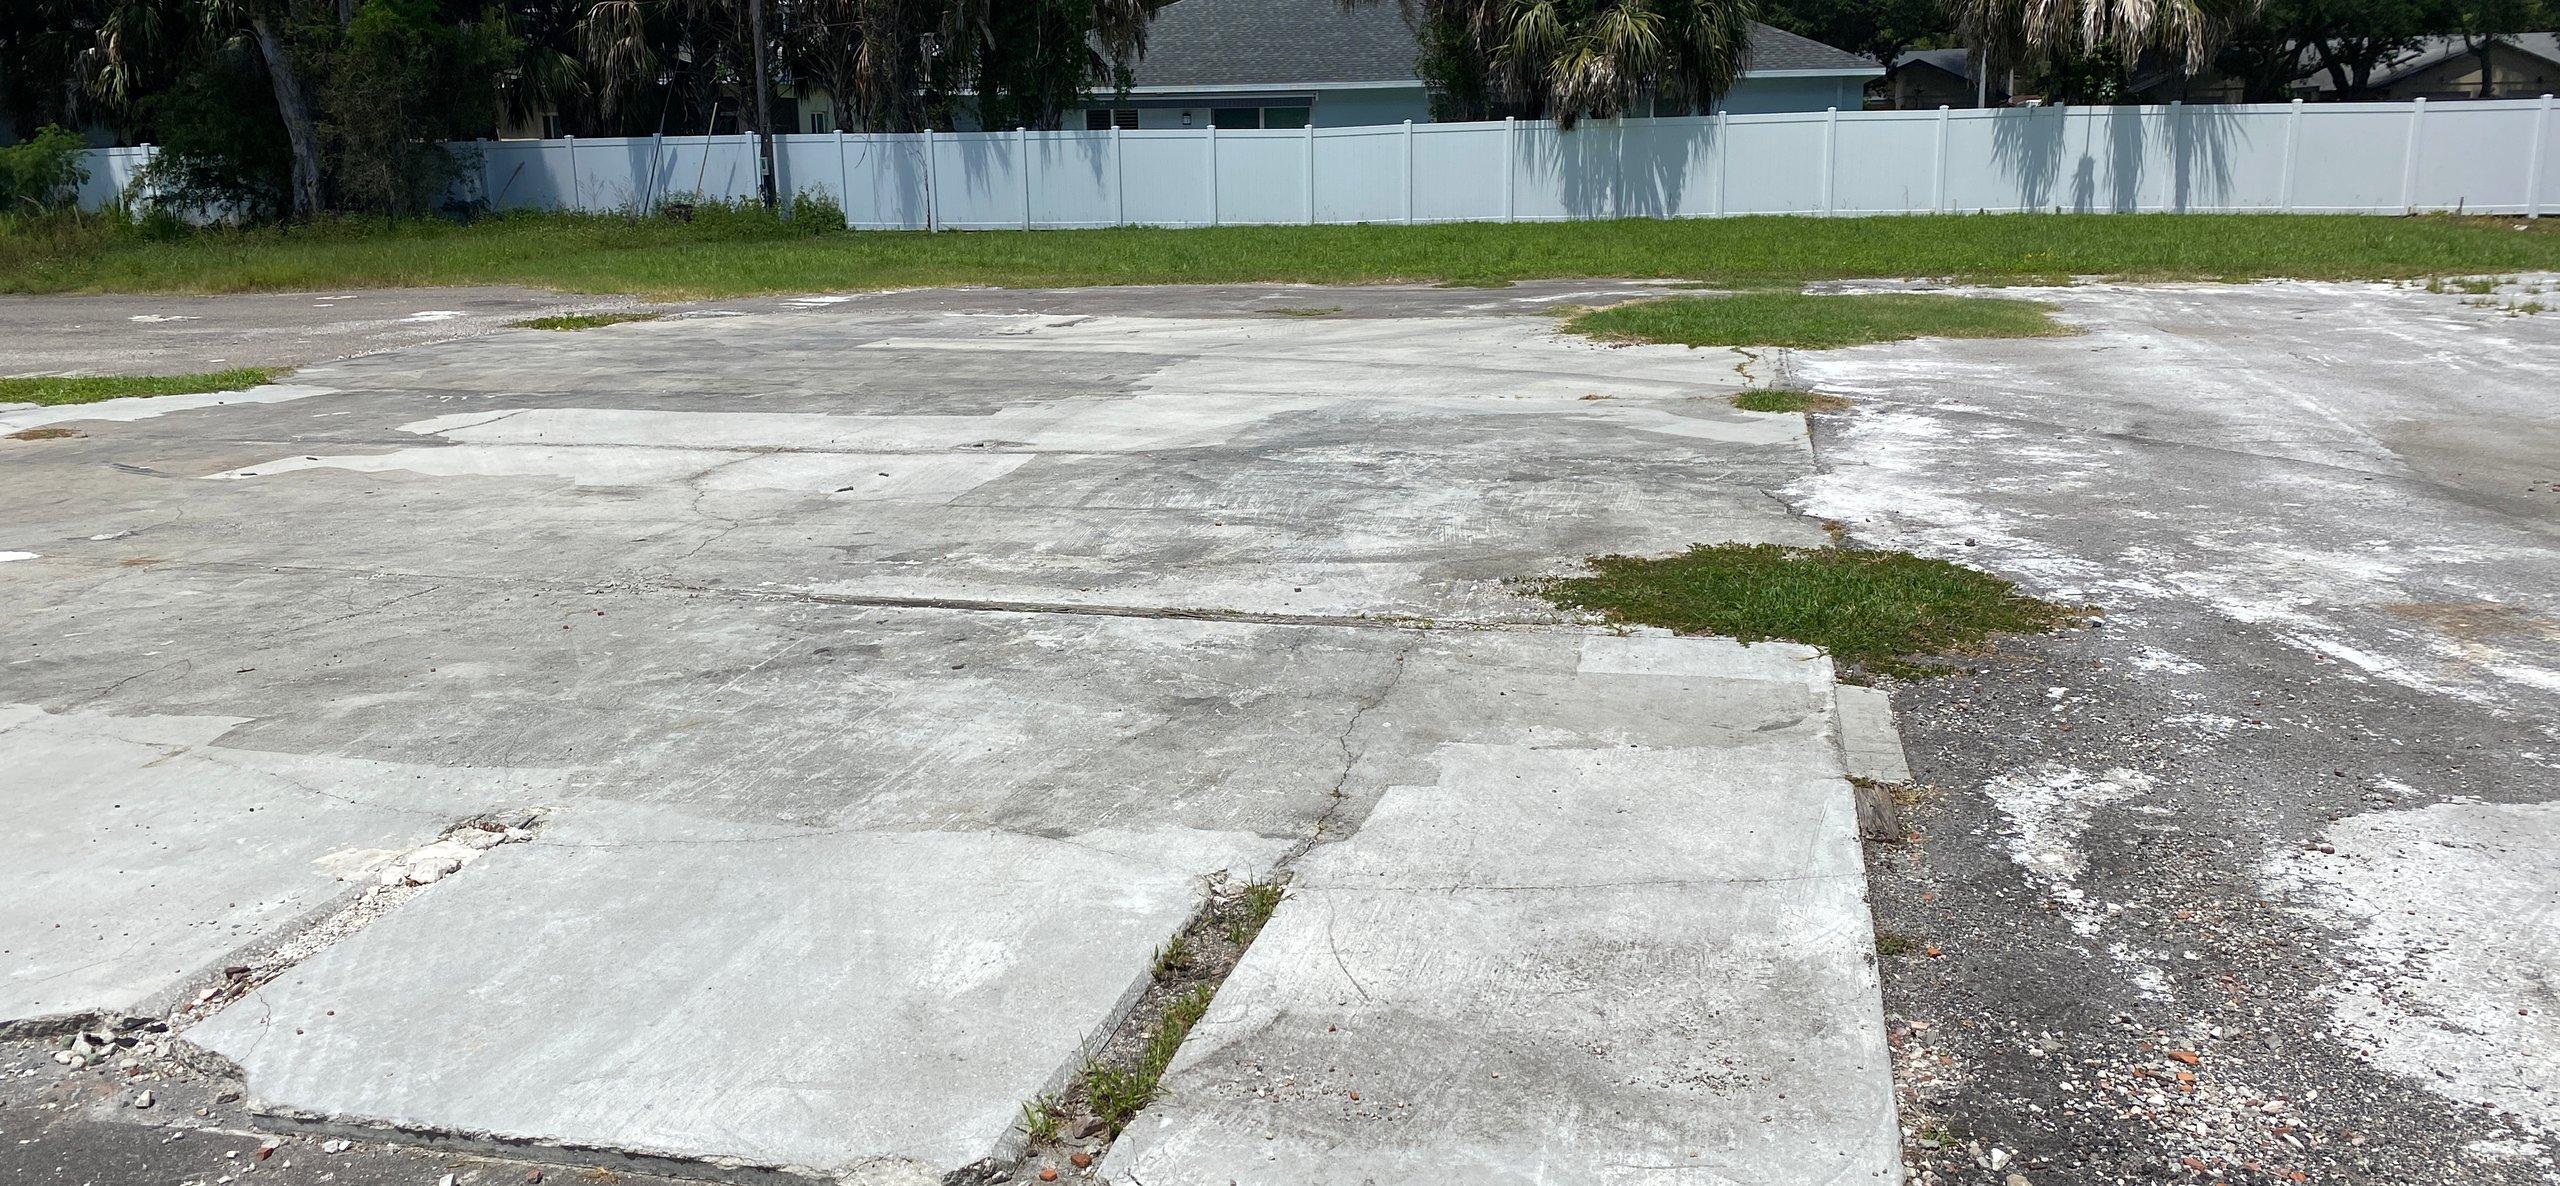 40x50 Parking Lot self storage unit